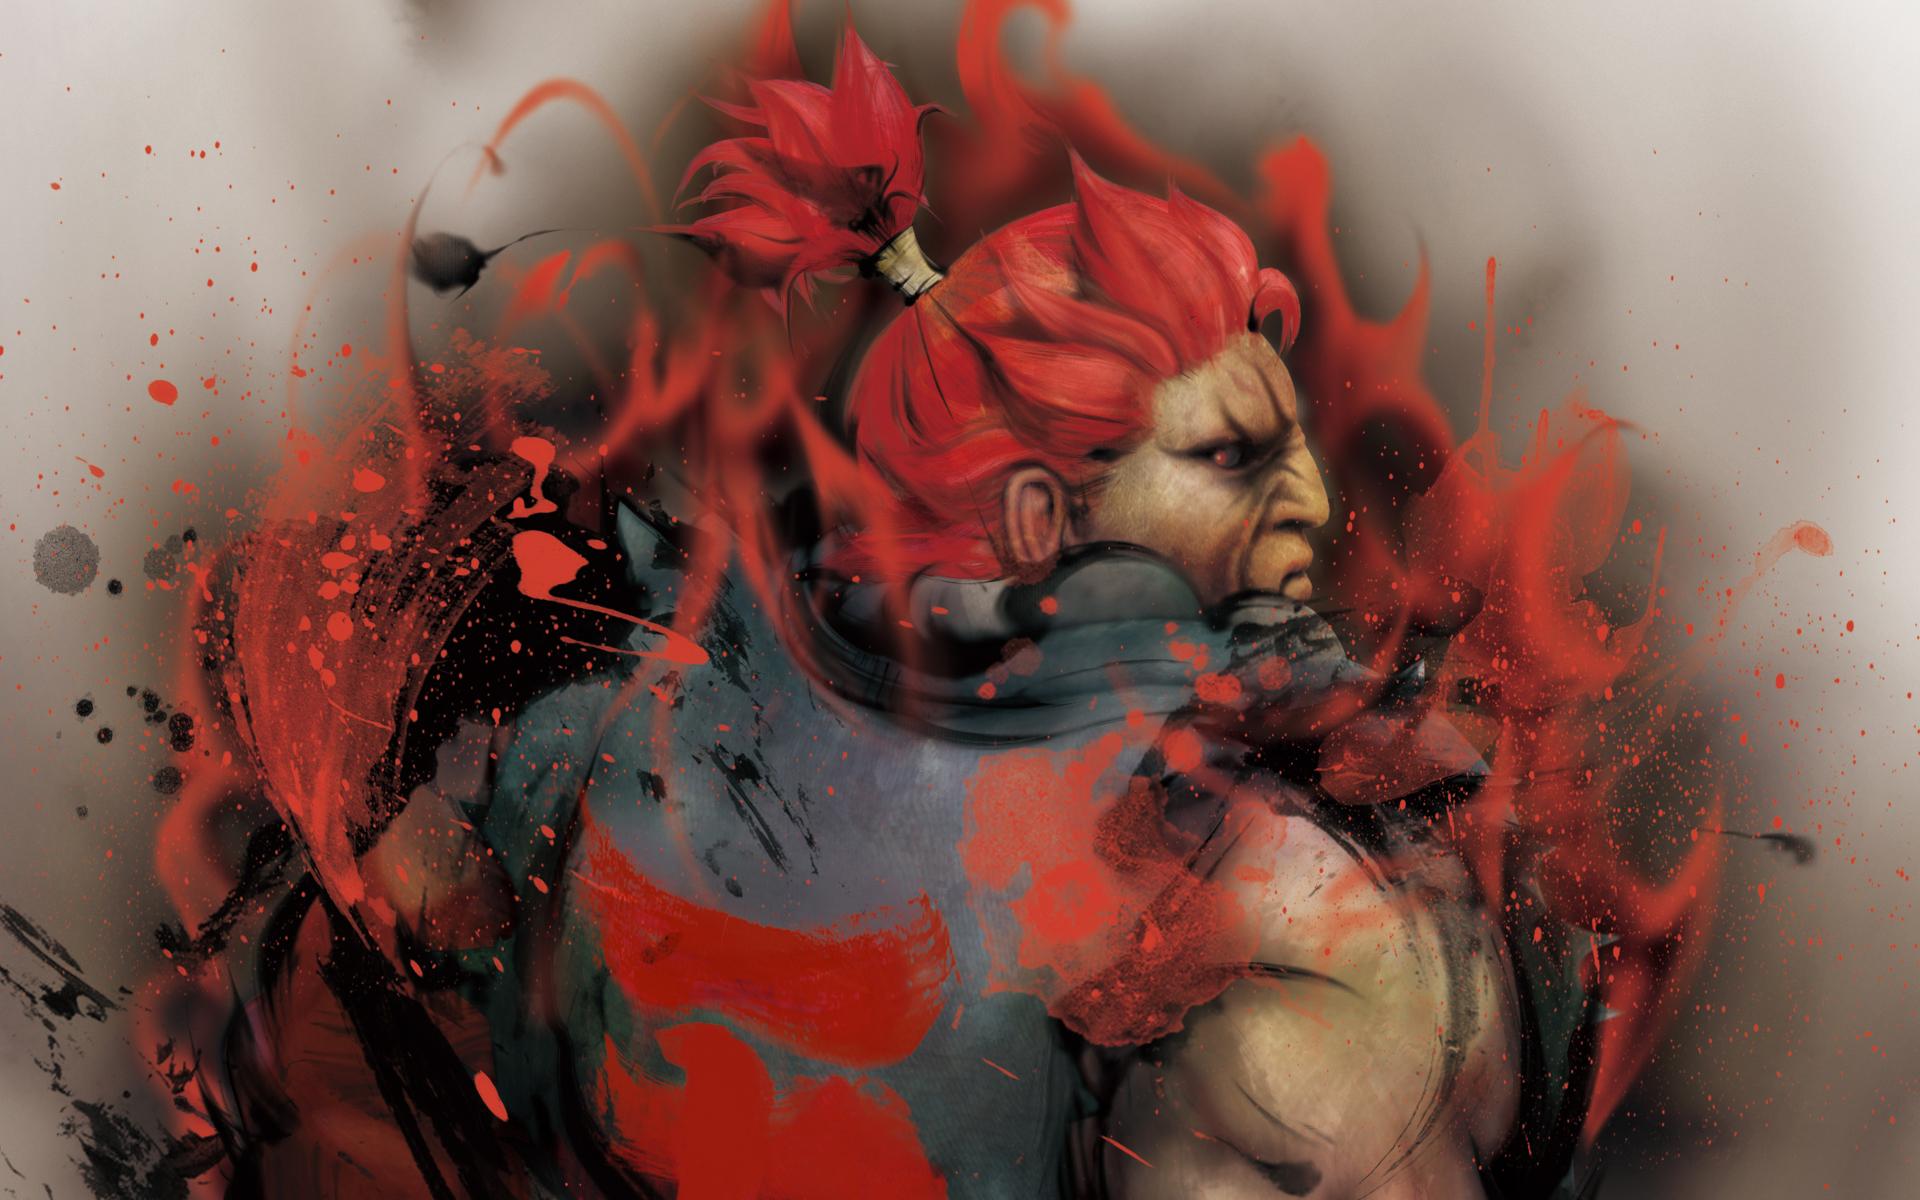 11 akuma street fighter hd wallpapers background - Akuma oni wallpaper ...